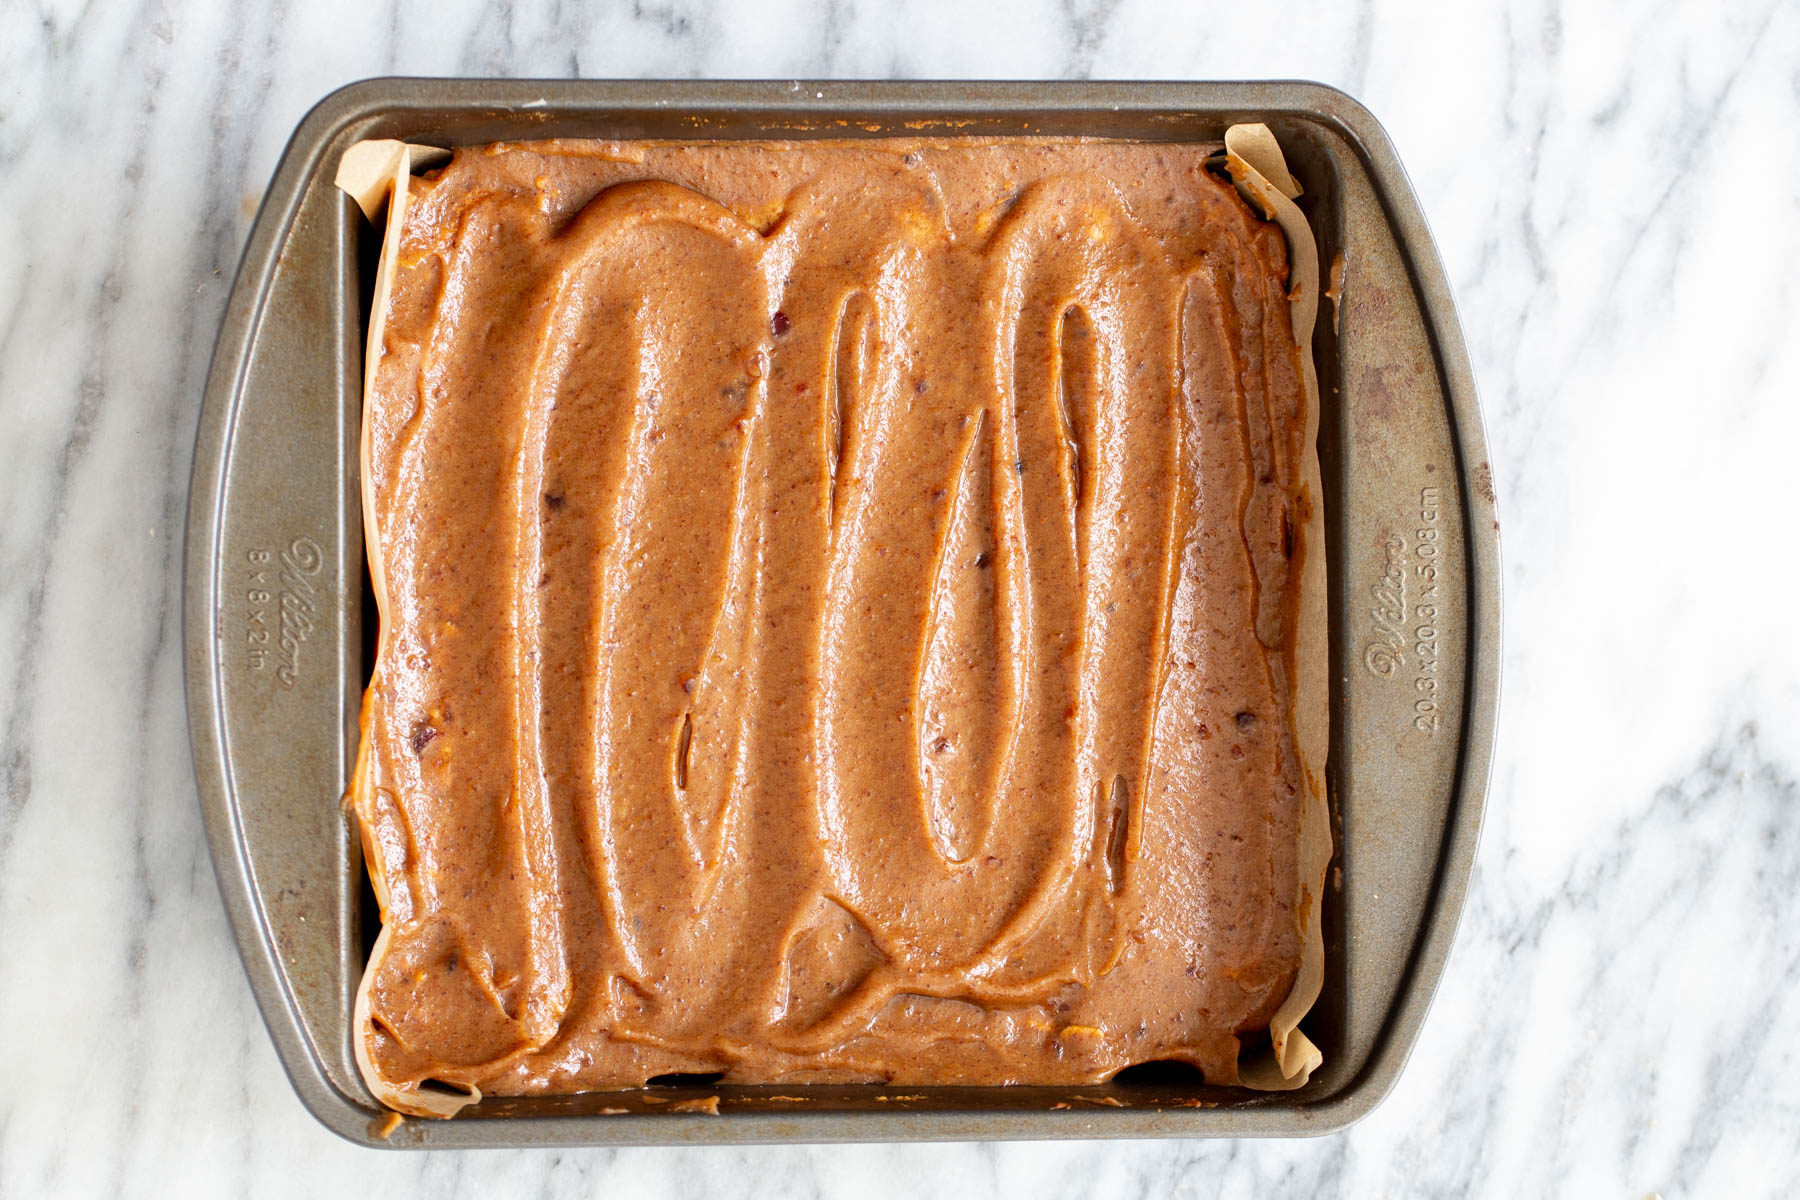 vegan date caramel being spread on oatmeal batter to make vegan date caramel oatmeal bars